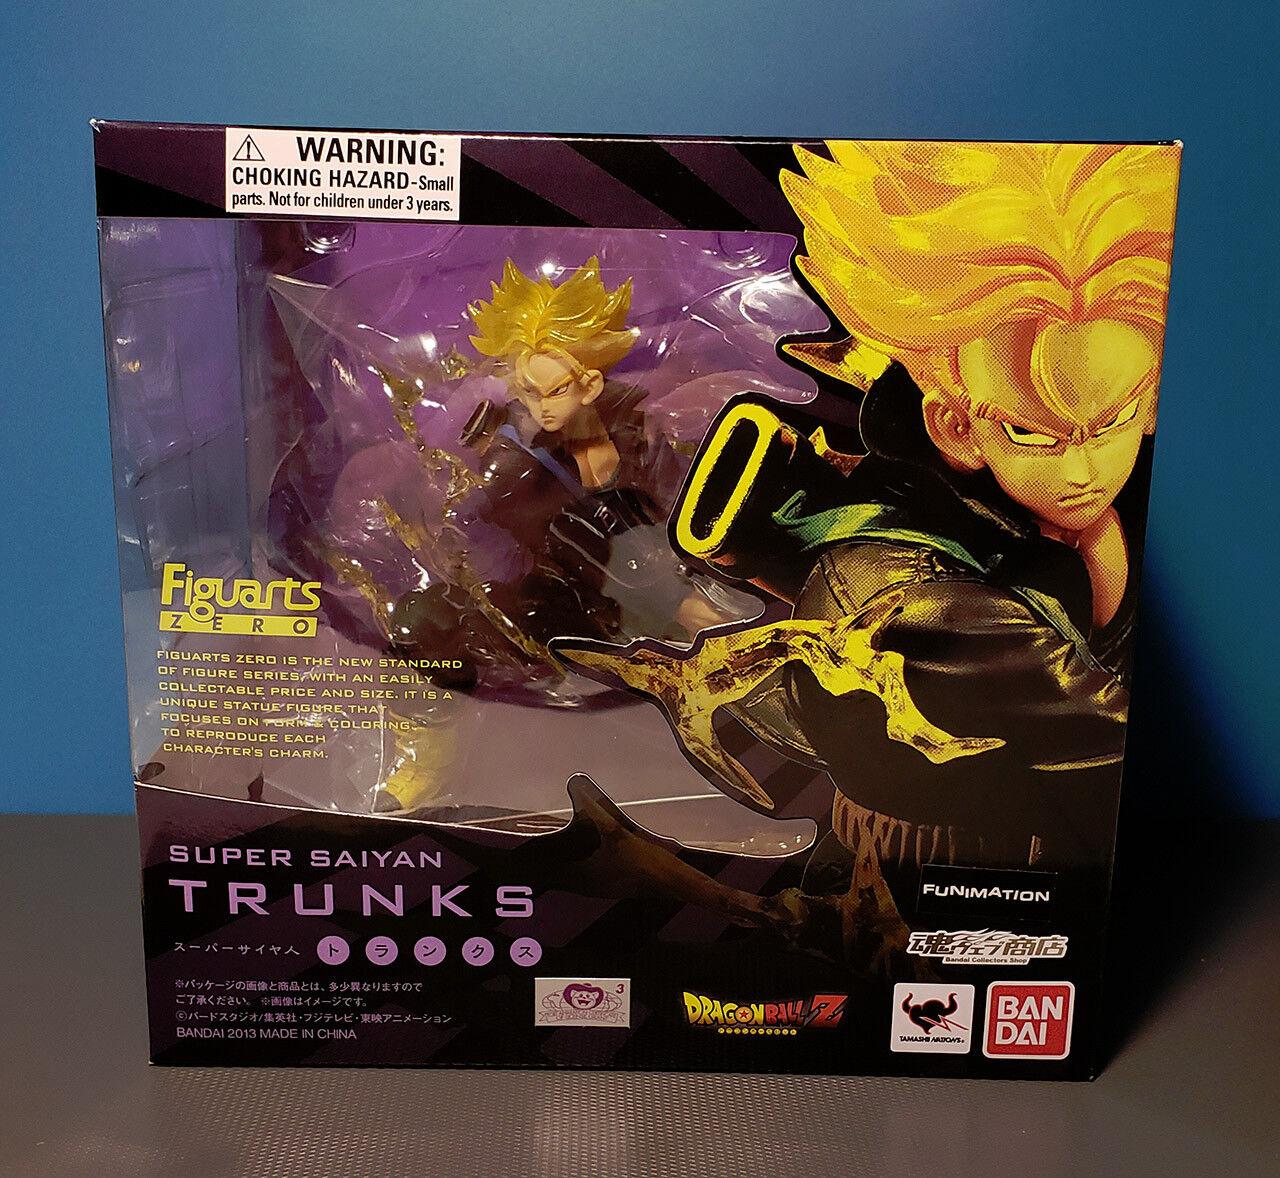 Dragonball Z  Figuarts Zero Super Saiyan TcourirKS SS Future Boîte d'origine jamais ouverte Tamashii Nations  shopping en ligne